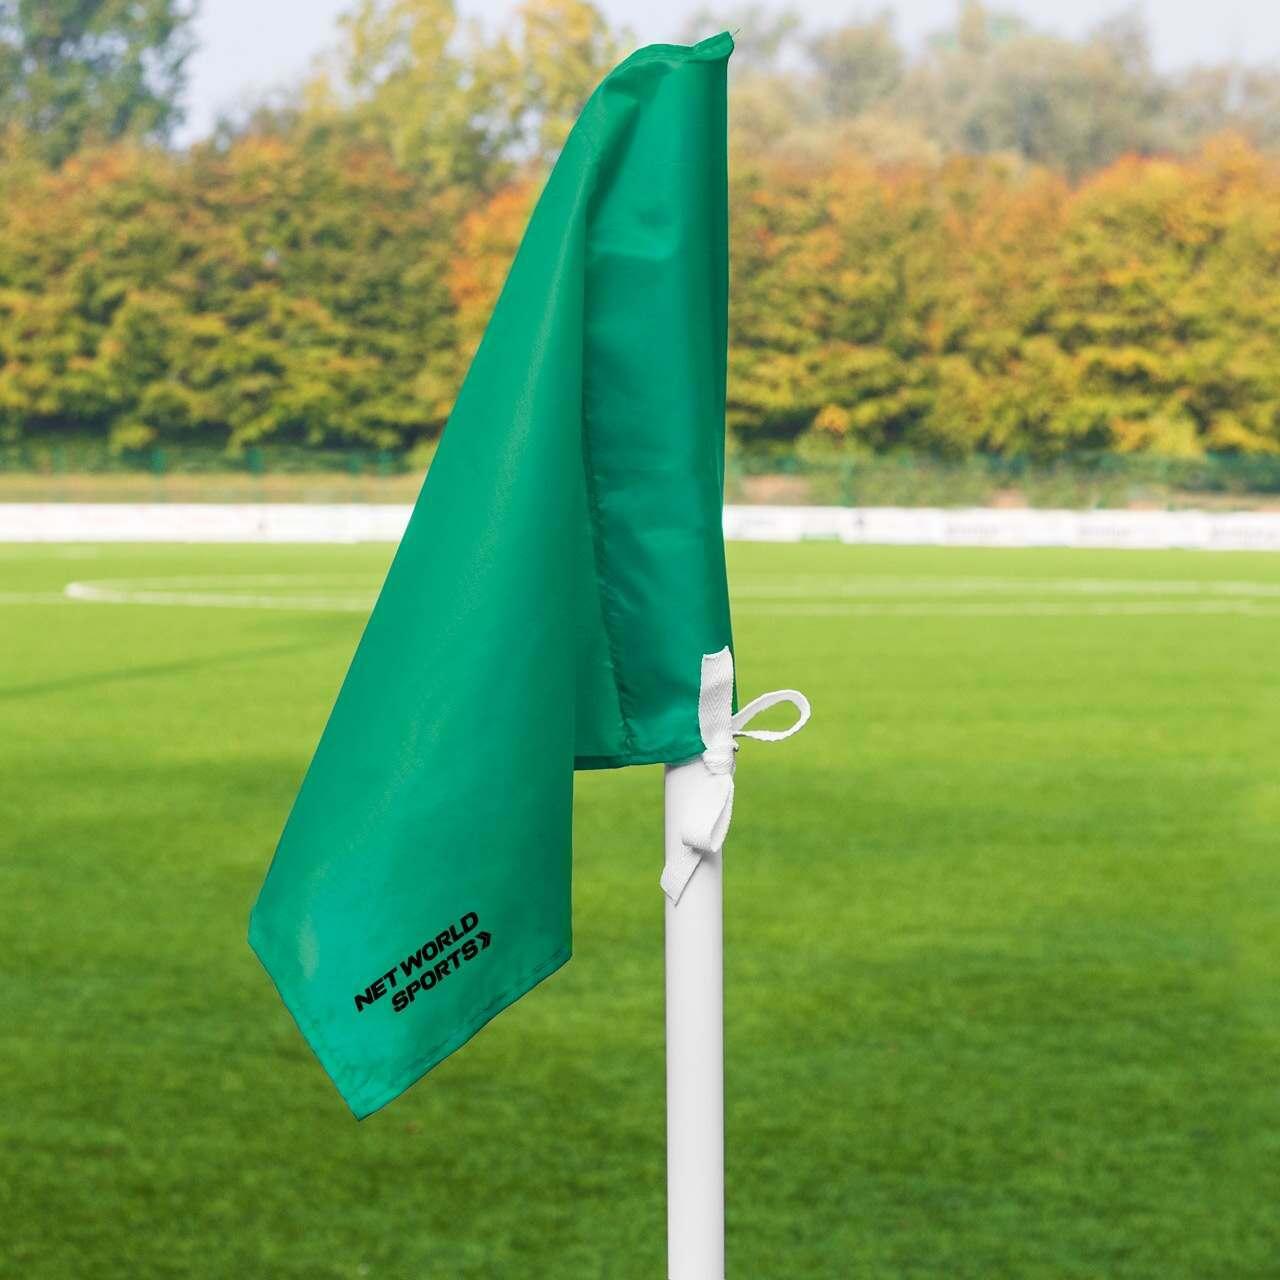 Green Spring Loaded Football Corner Flags [6 Pack]